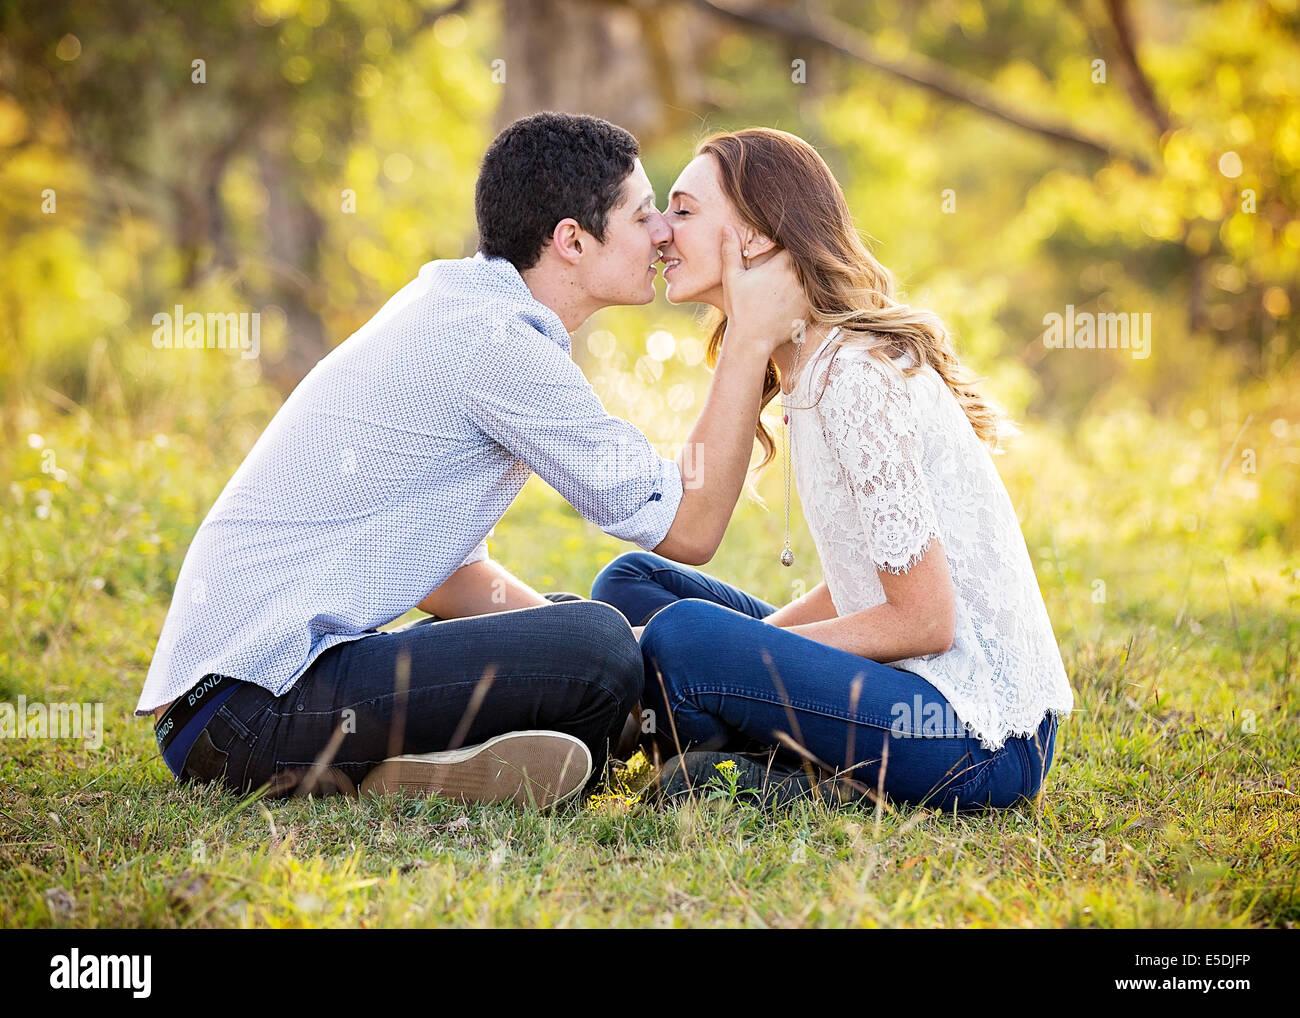 Una joven pareja acerca de beso Imagen De Stock